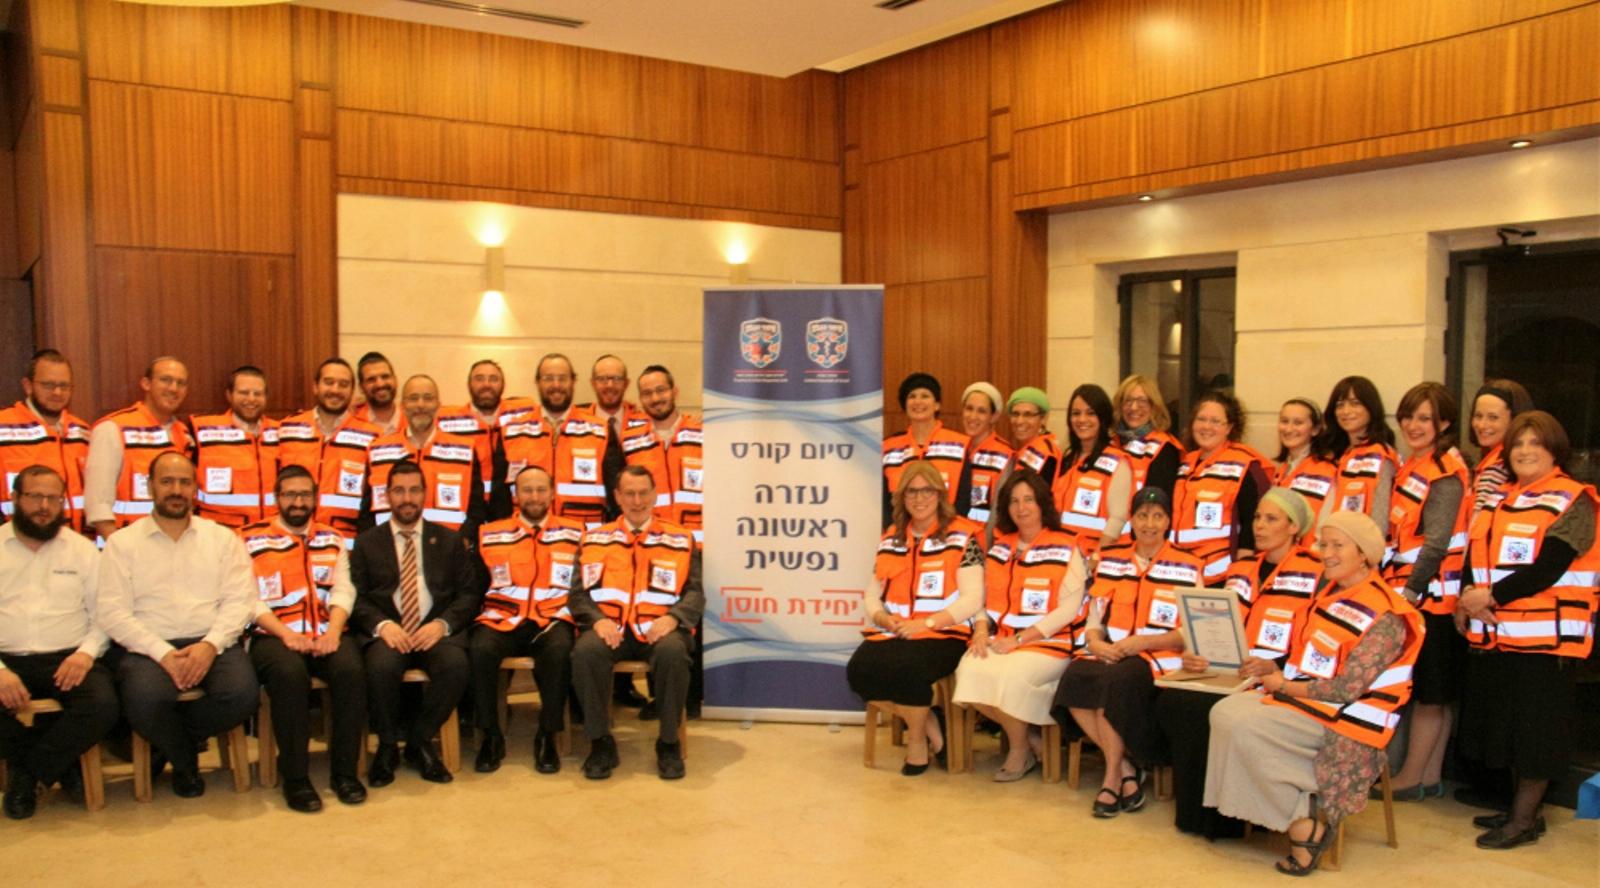 United Hatzalah's first class of psychotrauma counseling volunteers. Photo: courtesy